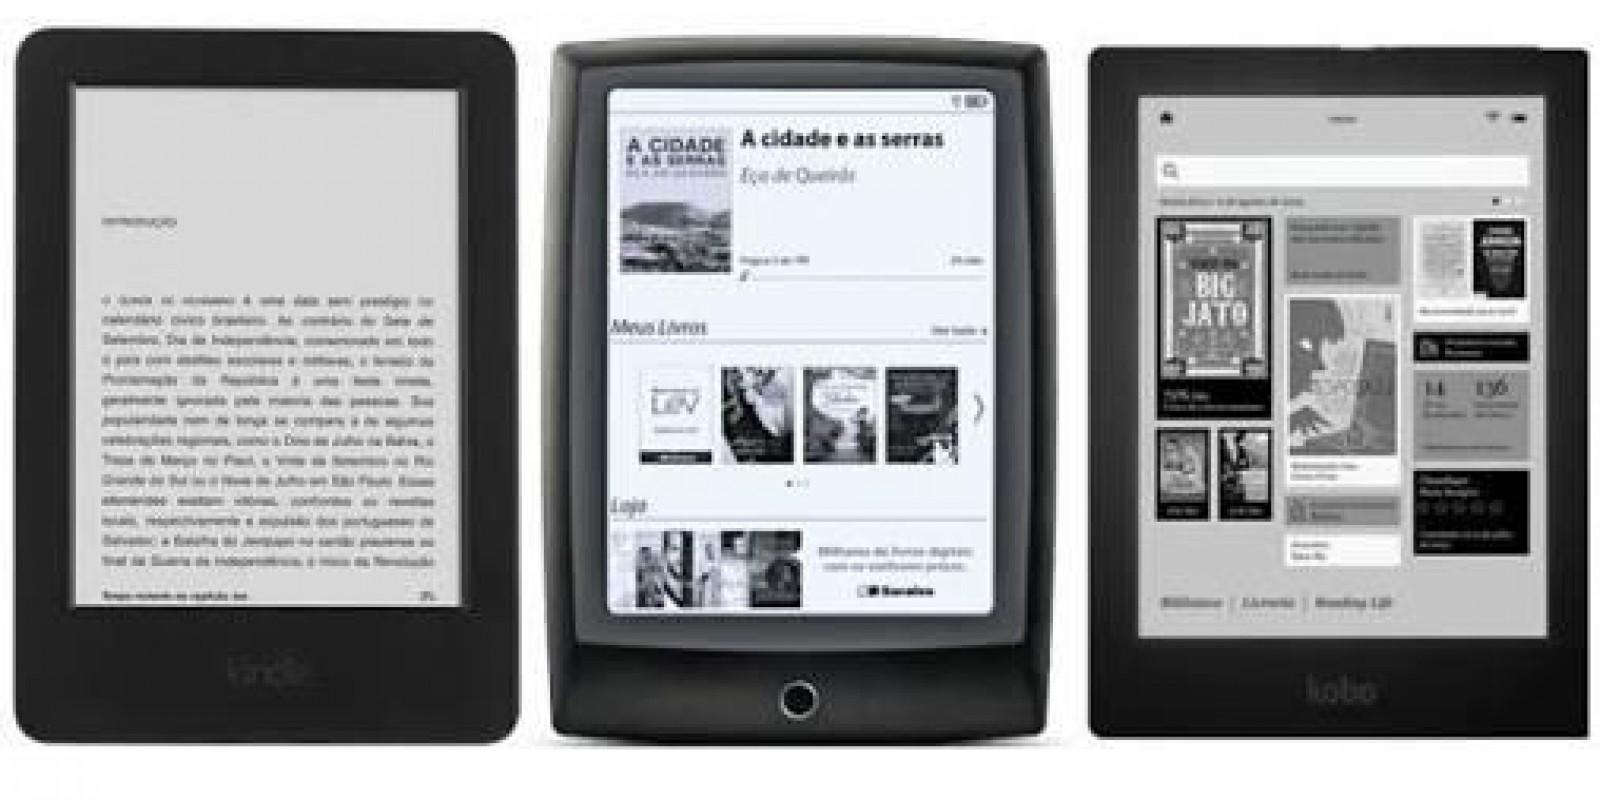 [Comparações entre Kindle, Kobo e Lev]